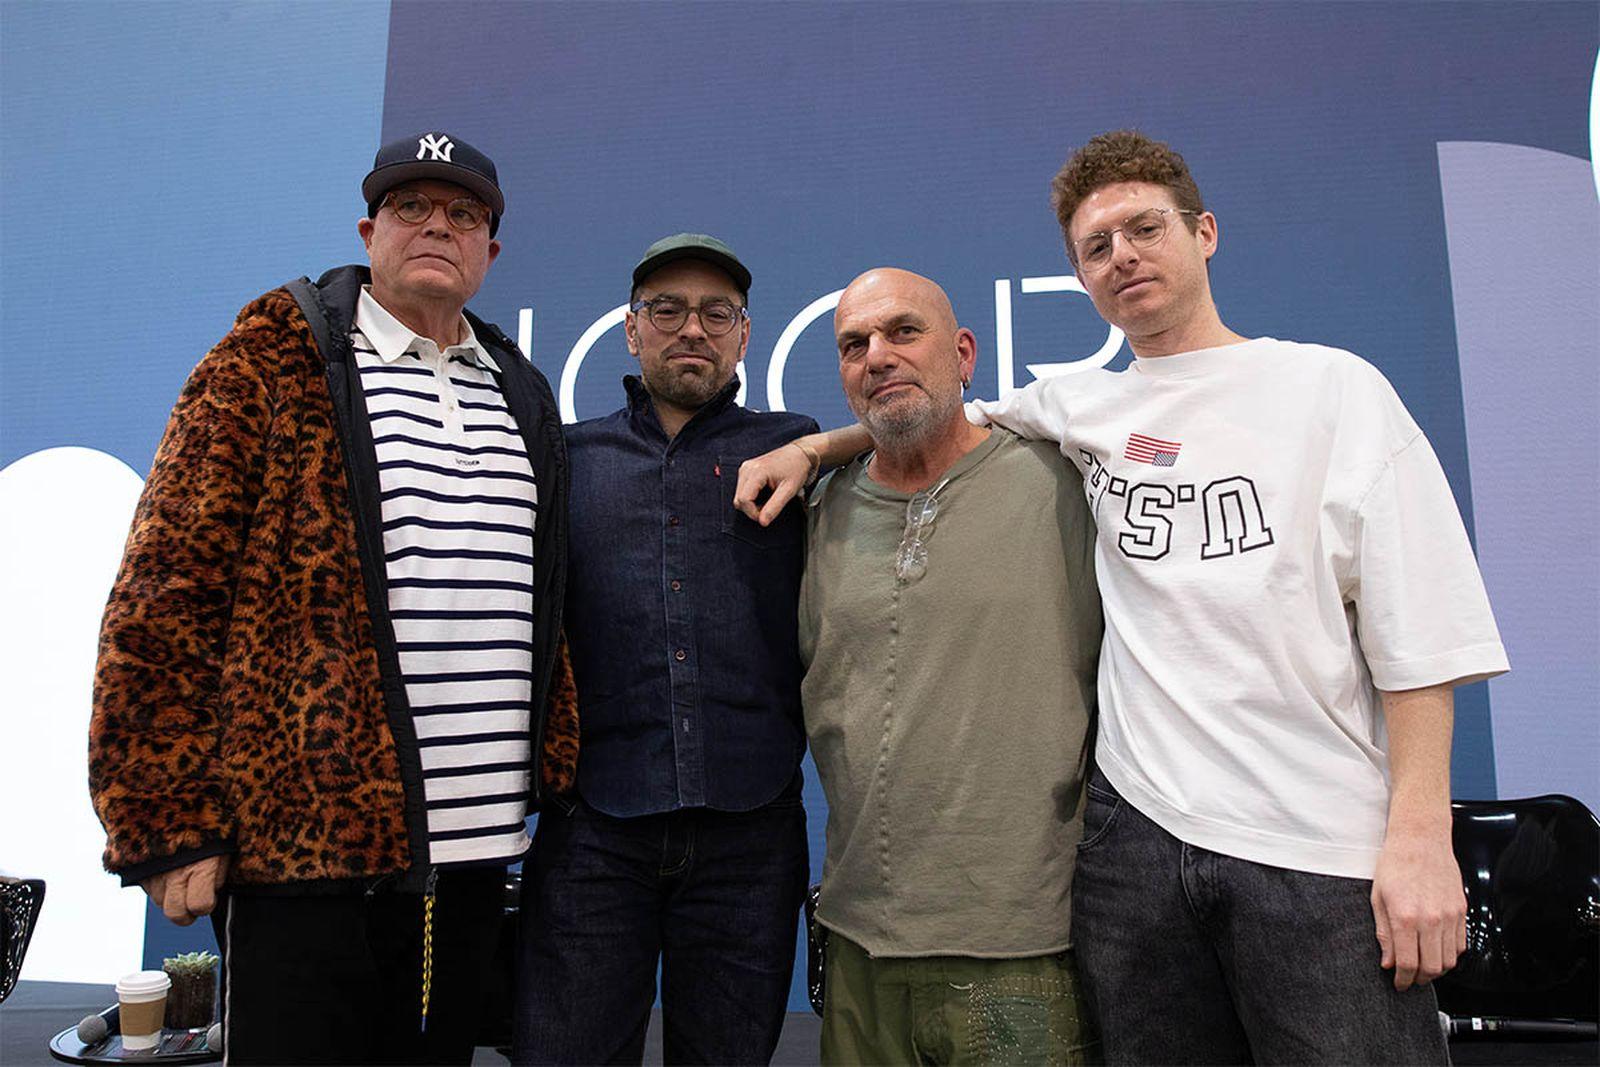 From left: Mark Werts, Jeff Carvalho, Maurizio Donadi, and Brock Cardiner.